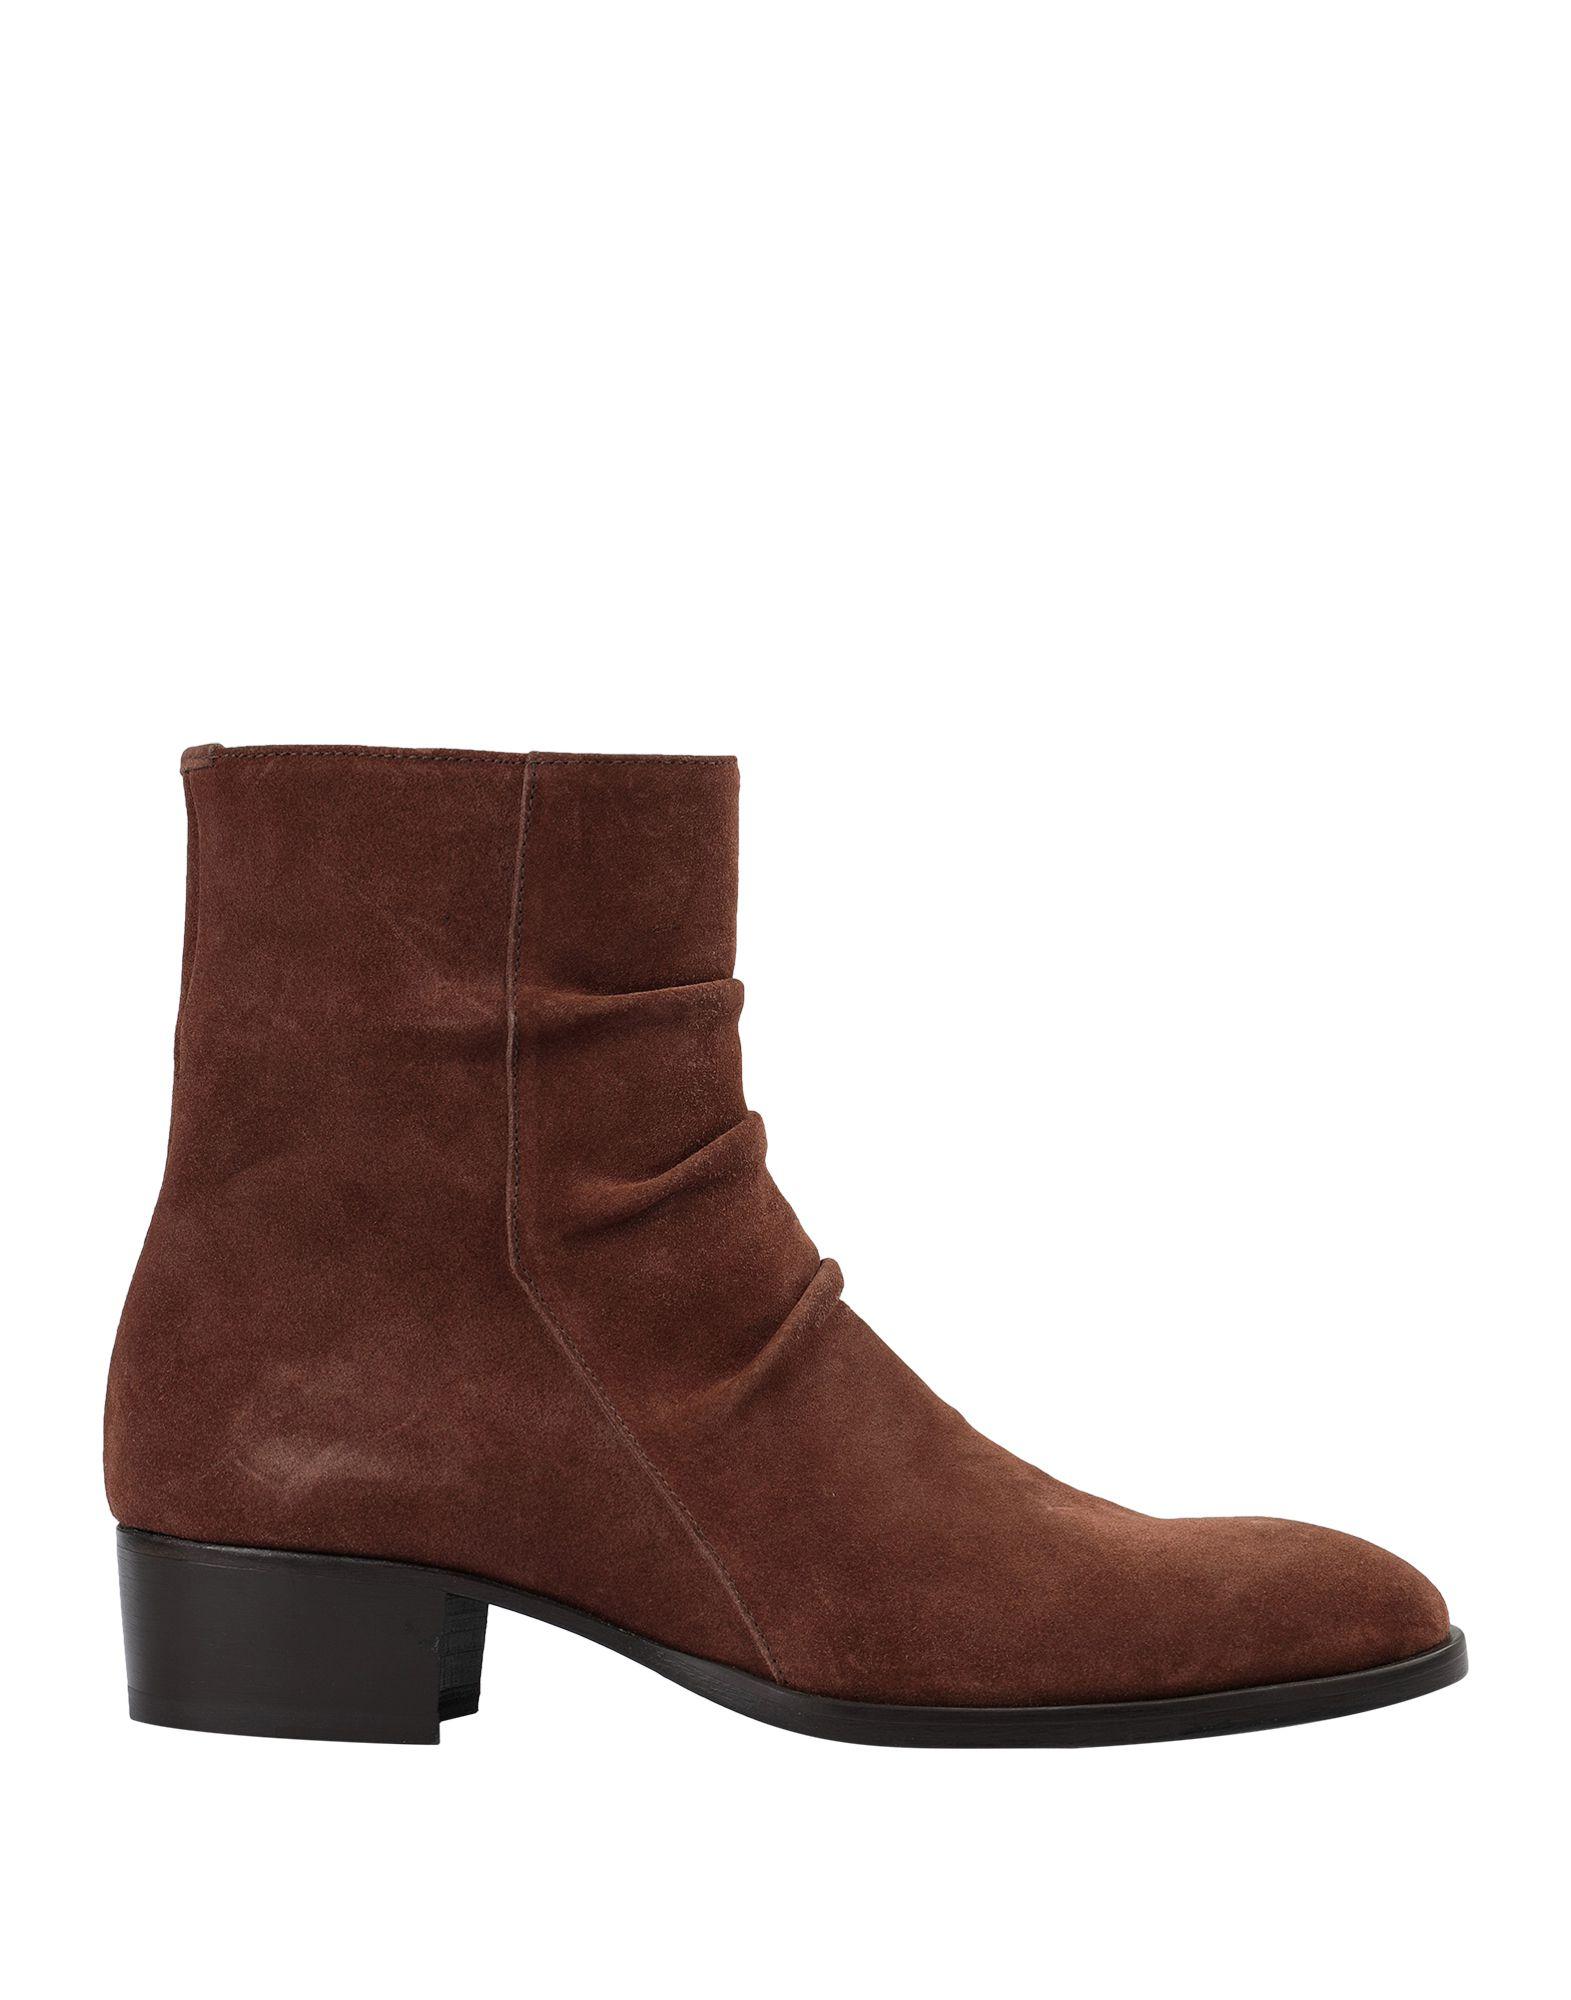 MATT MORO Полусапоги и высокие ботинки ботинки matt nawill matt nawill ma085awwdp48